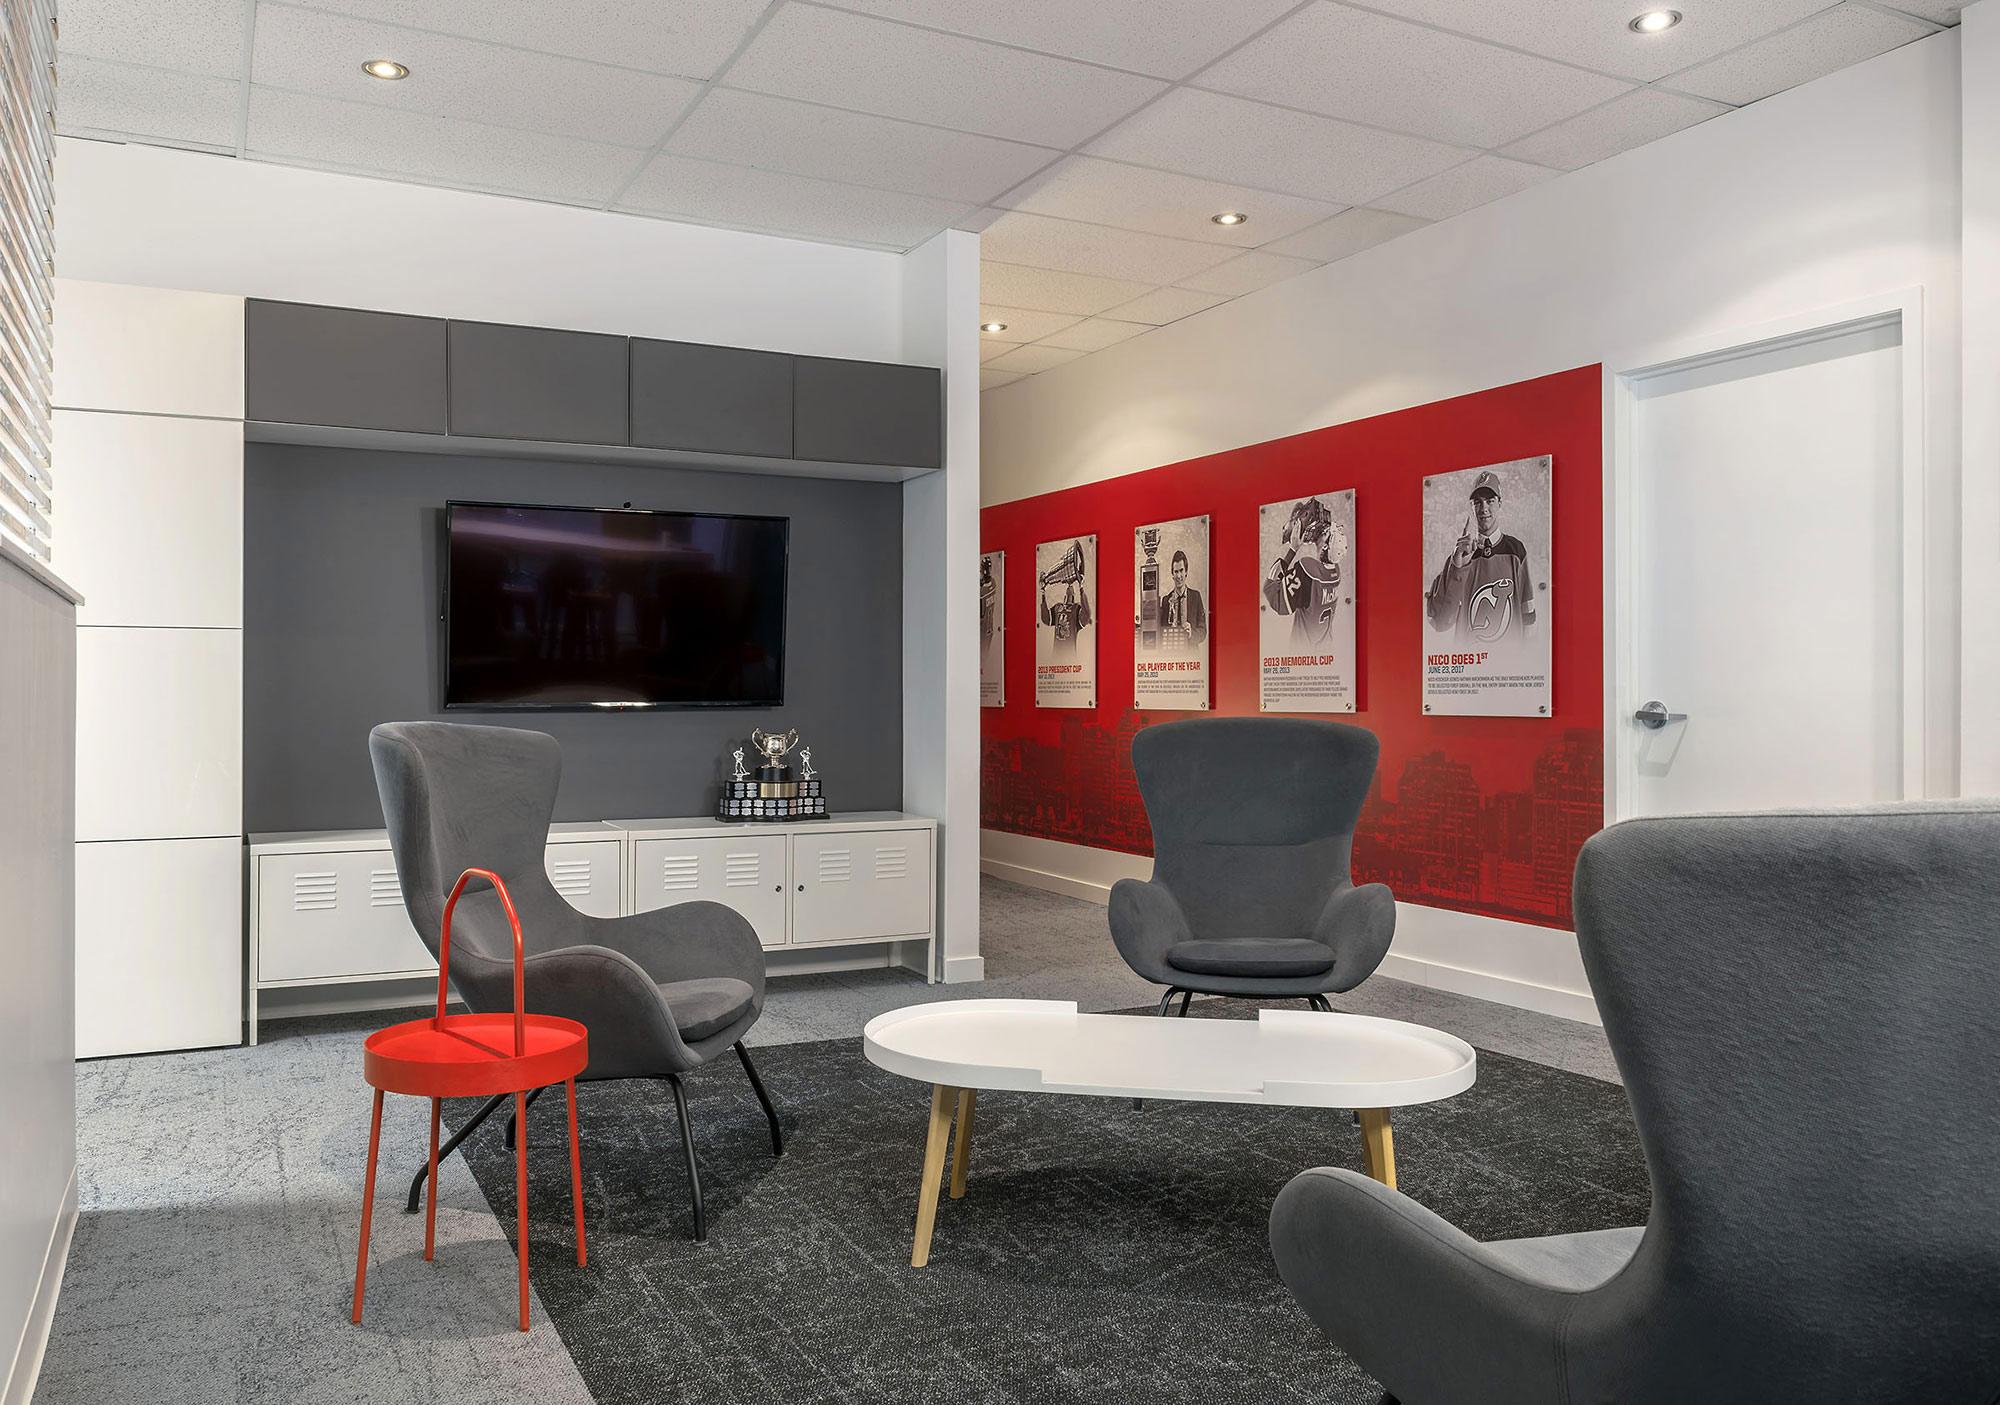 interior-design-athletic-hokcey-office.jpg